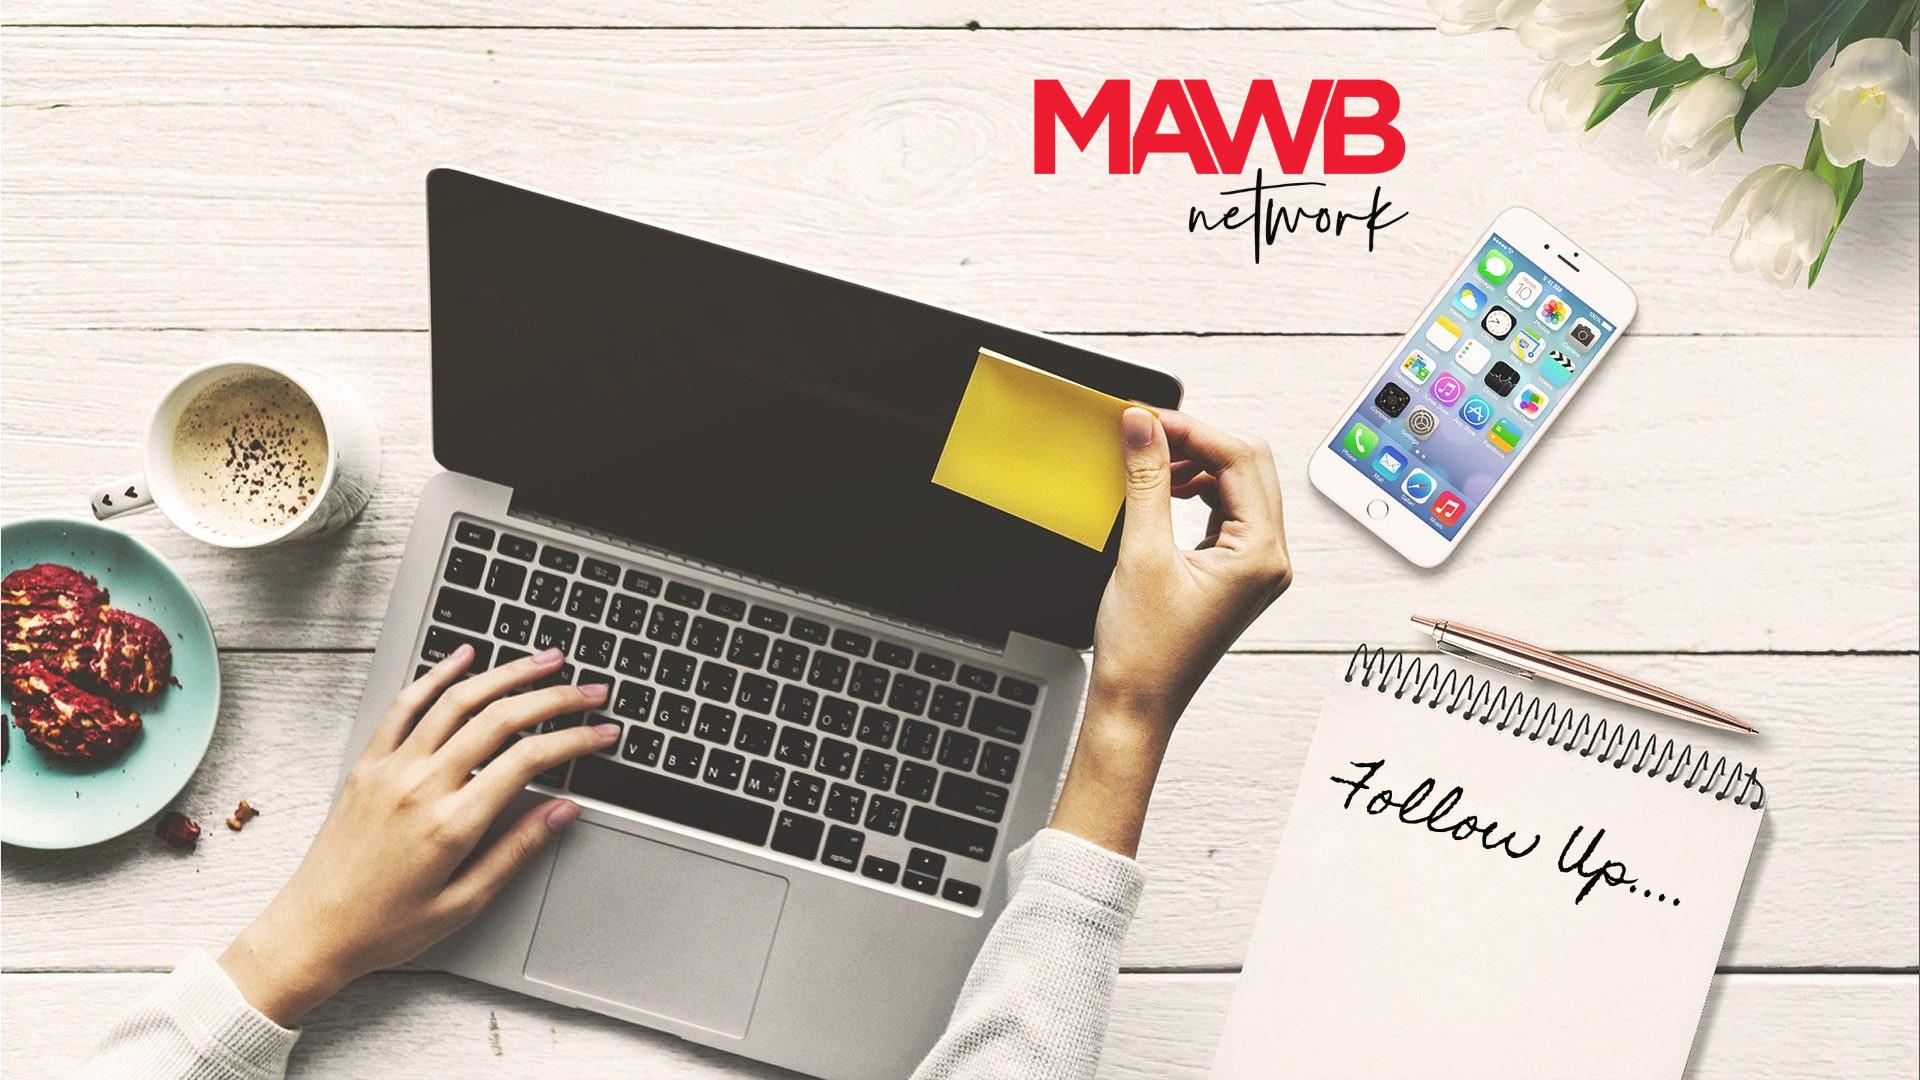 MAWB - Customer Care / Follow Up with Mirella Canavan